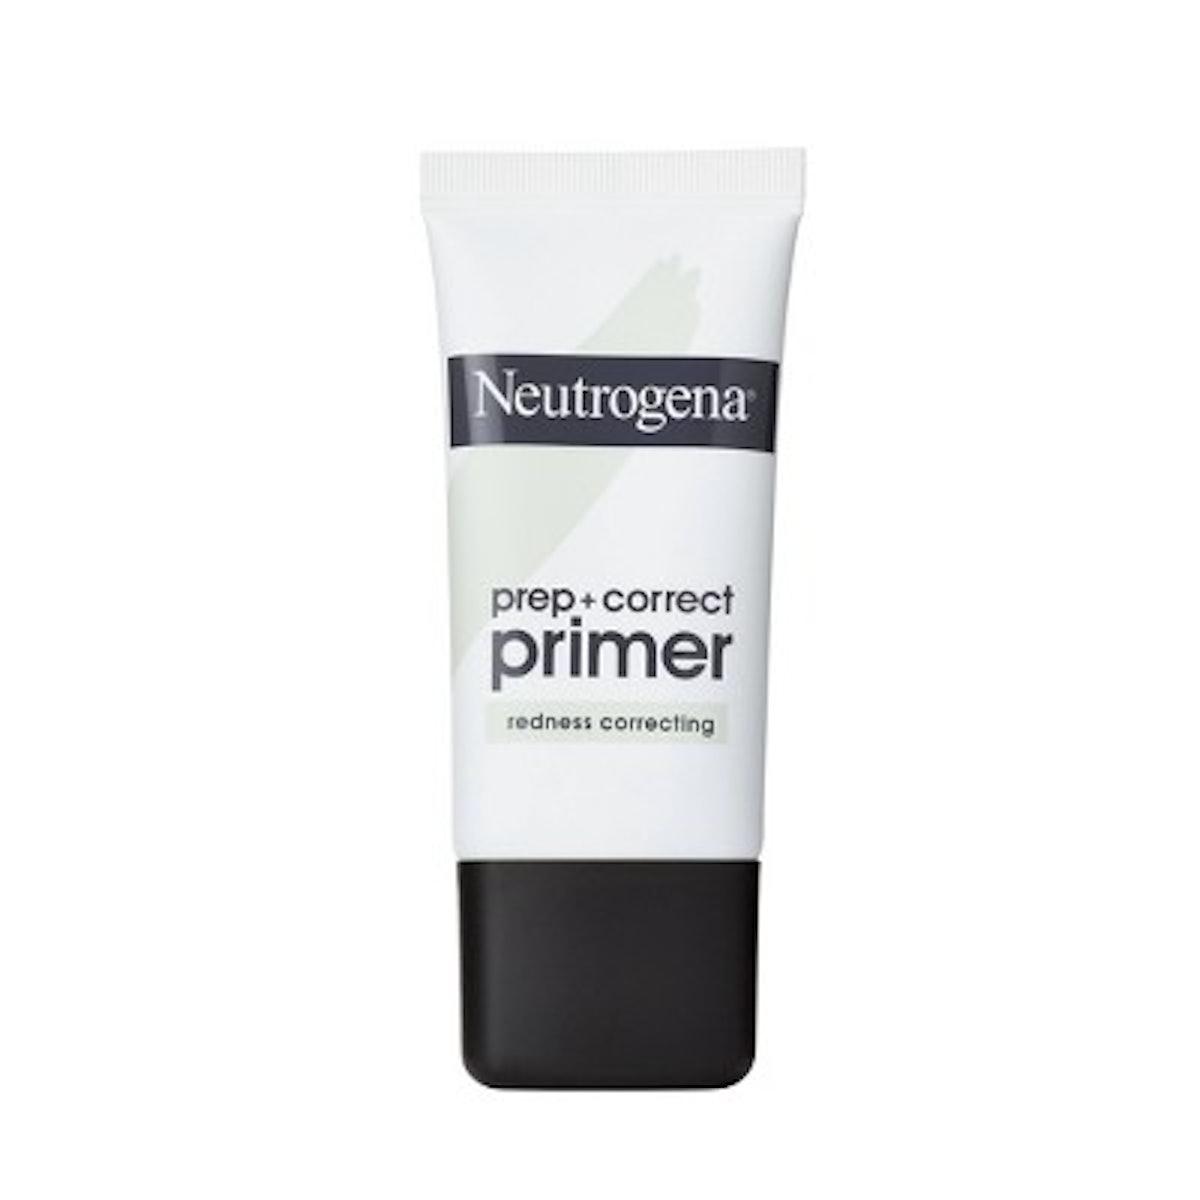 Neutrogena Cosmetics Prep + Correct Primers - 1oz